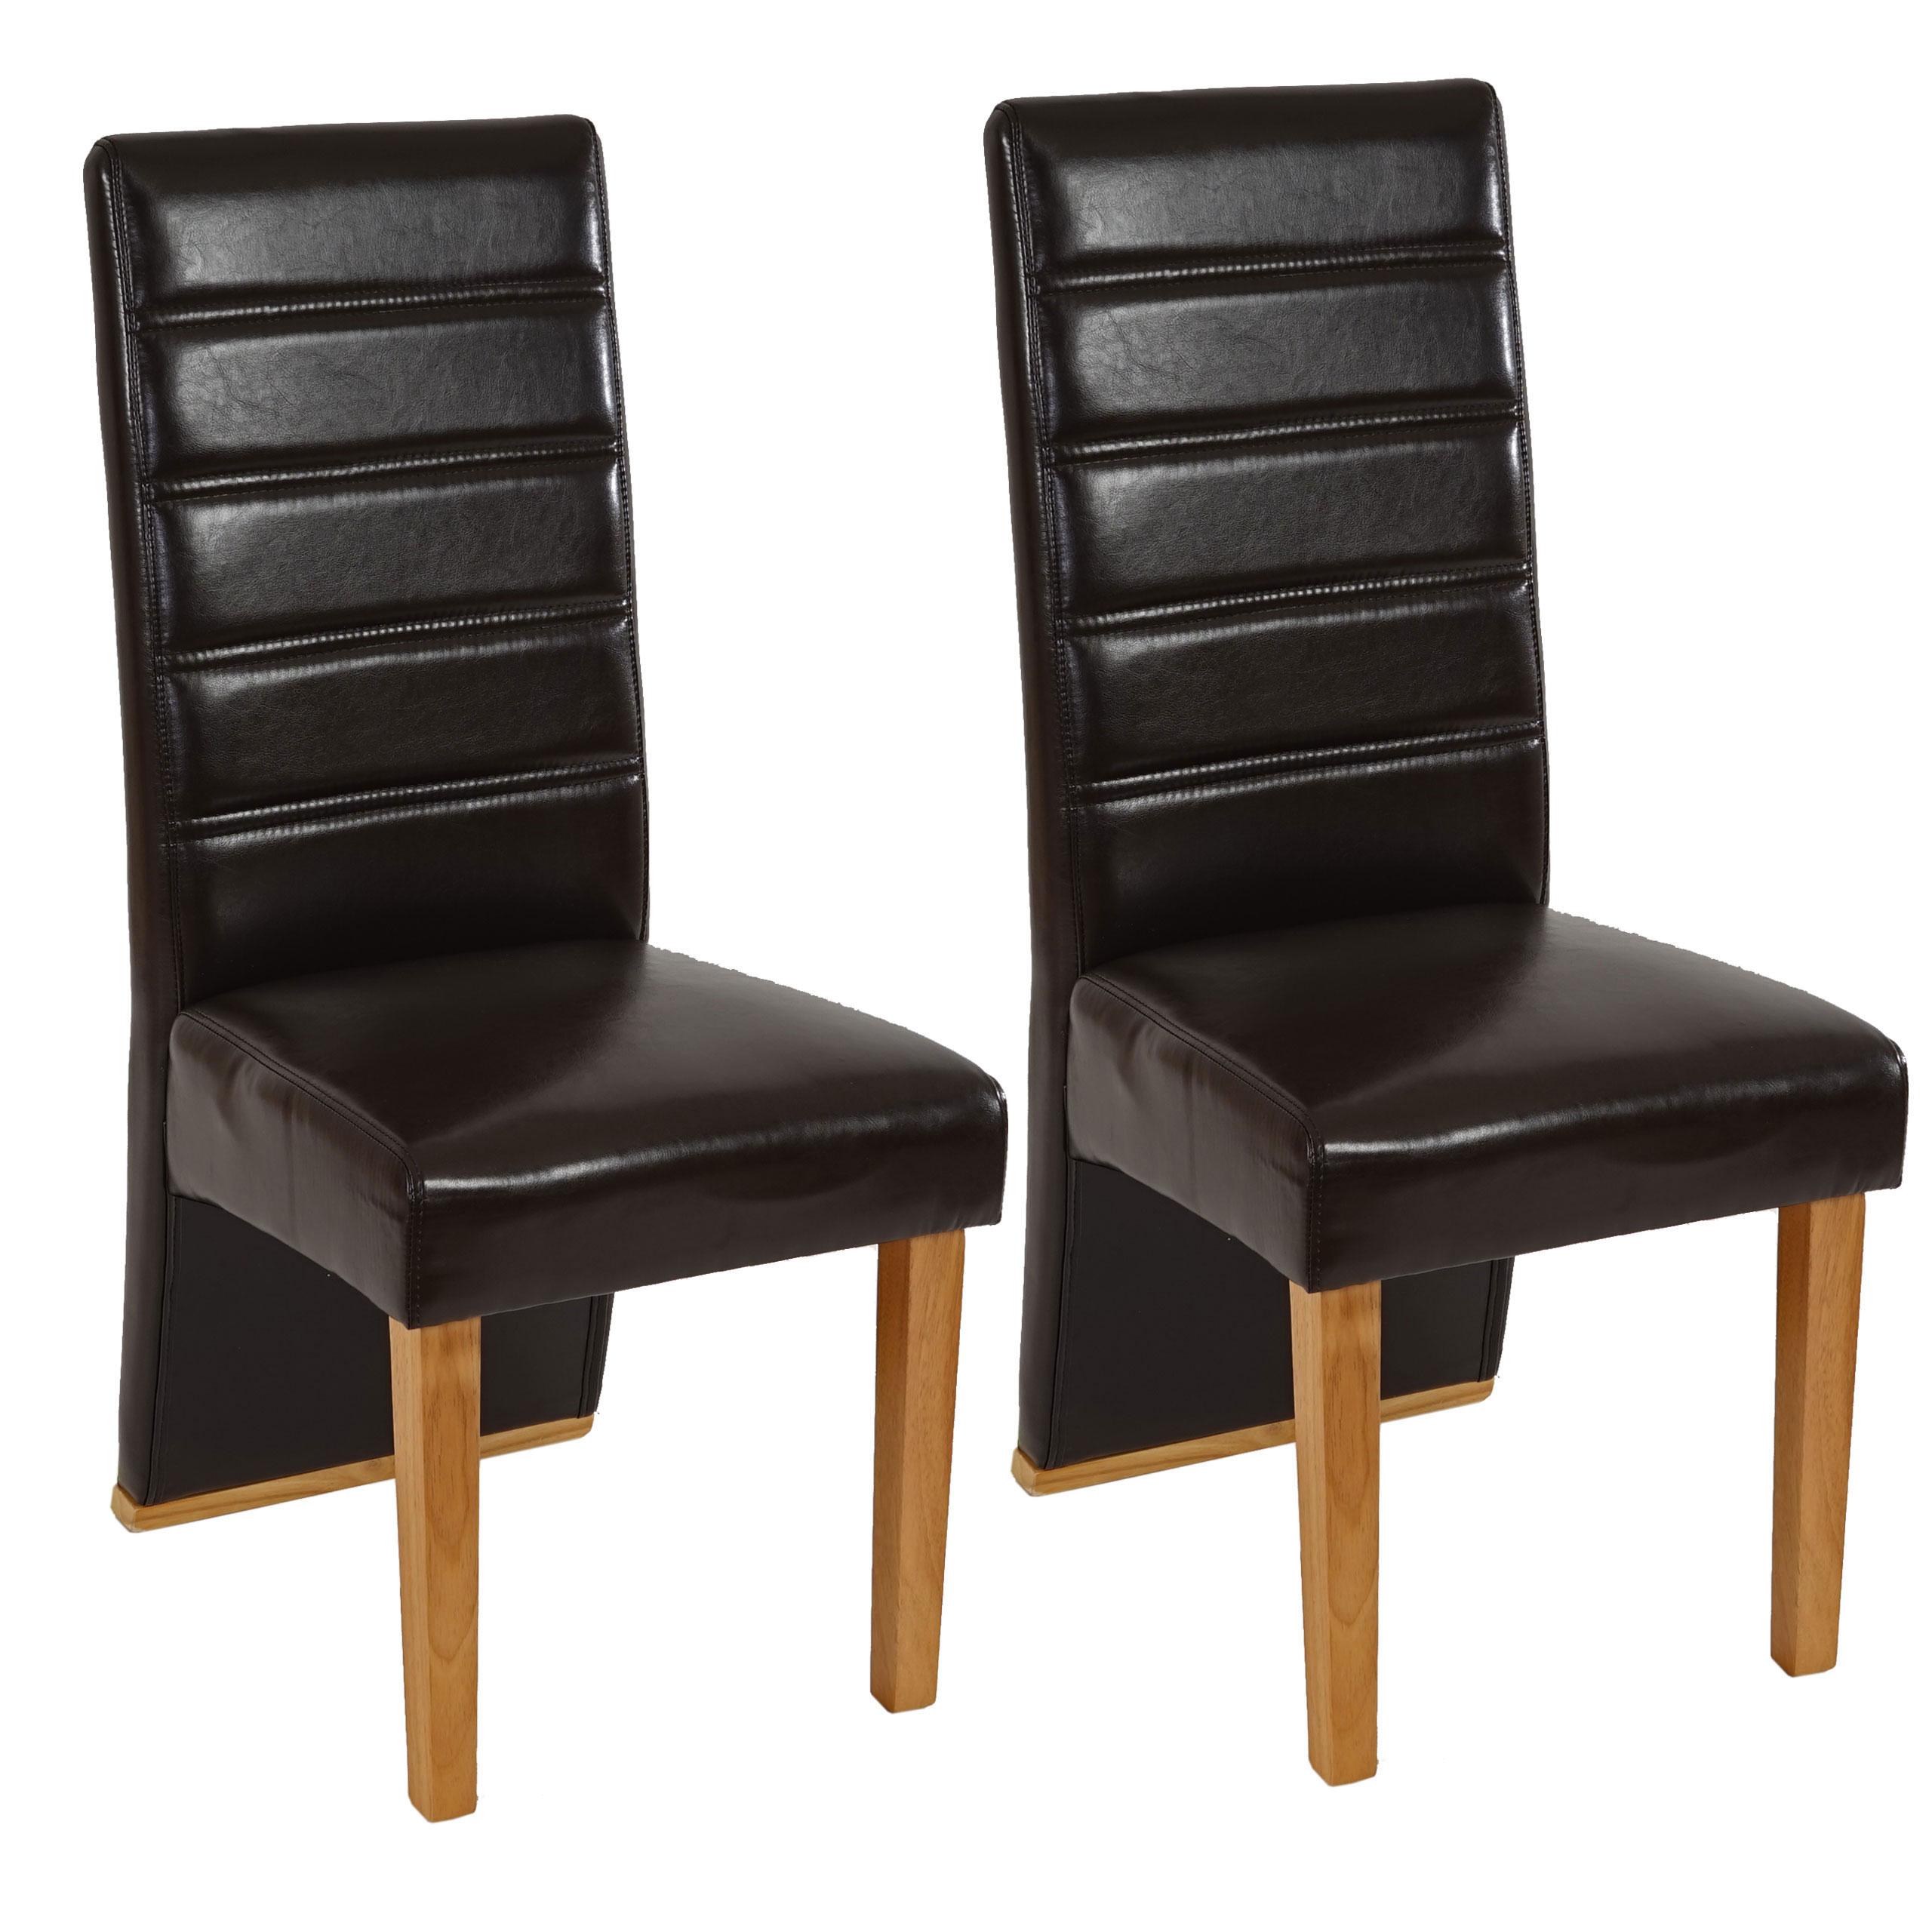 2x esszimmerstuhl krems stuhl lehnstuhl hochlehner for Esszimmerstuhl braun